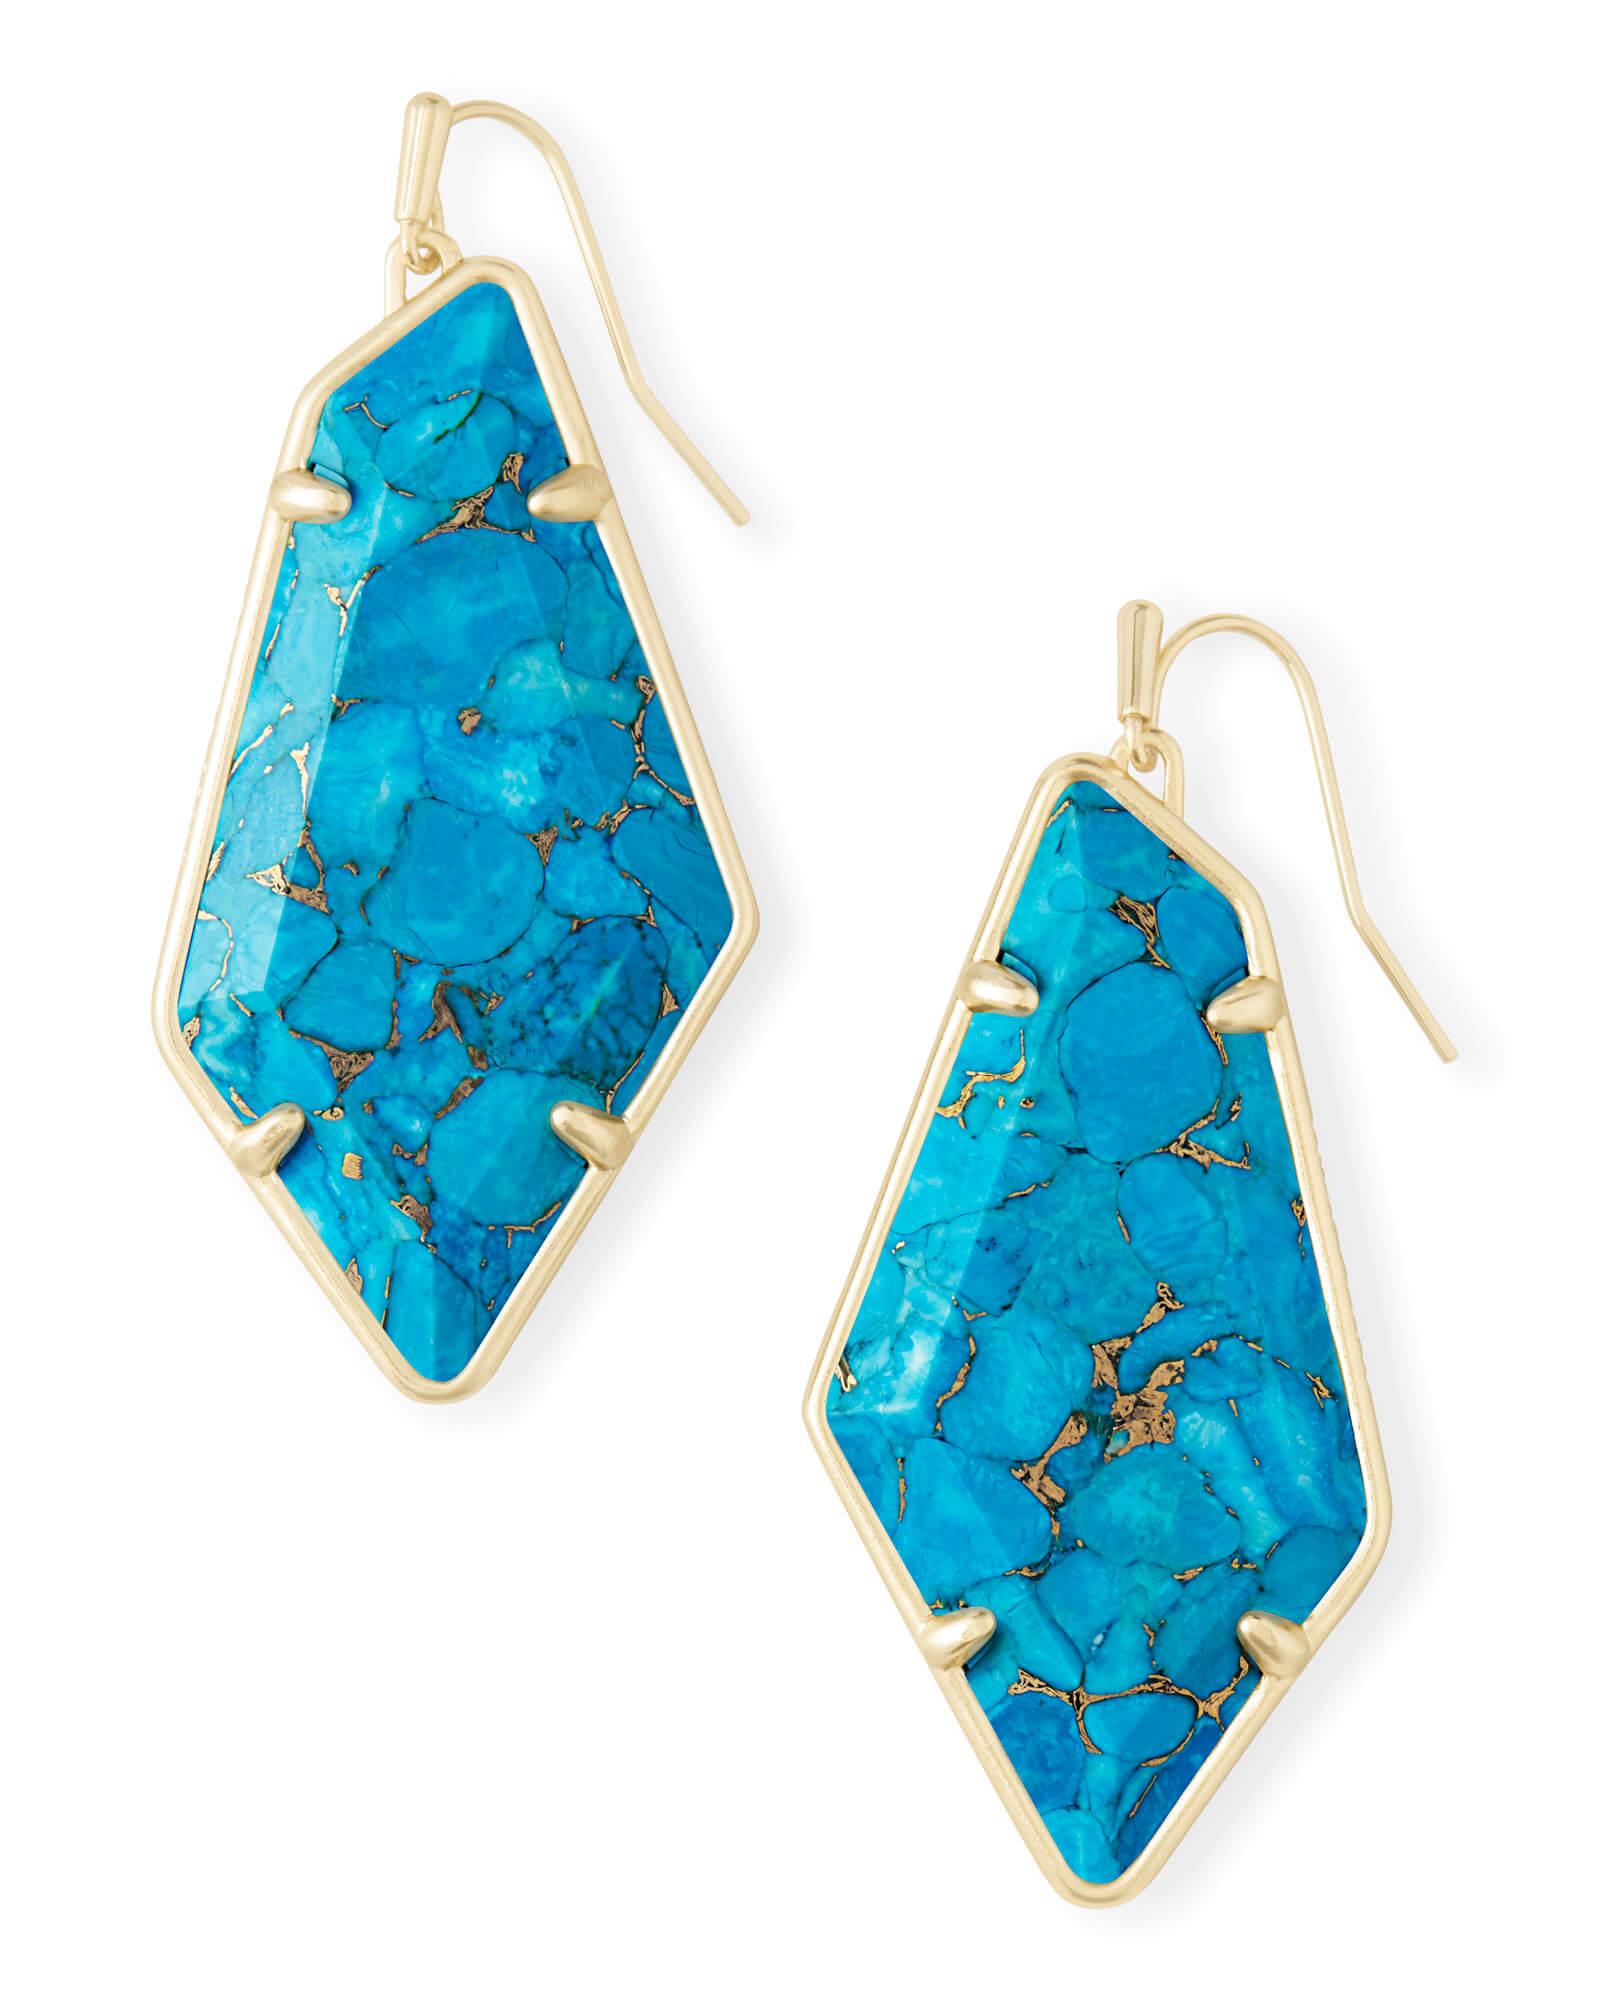 8ac87ed53a8bc Kendra Scott Bronze Veined Turquoise Earrings - Best All Earring ...